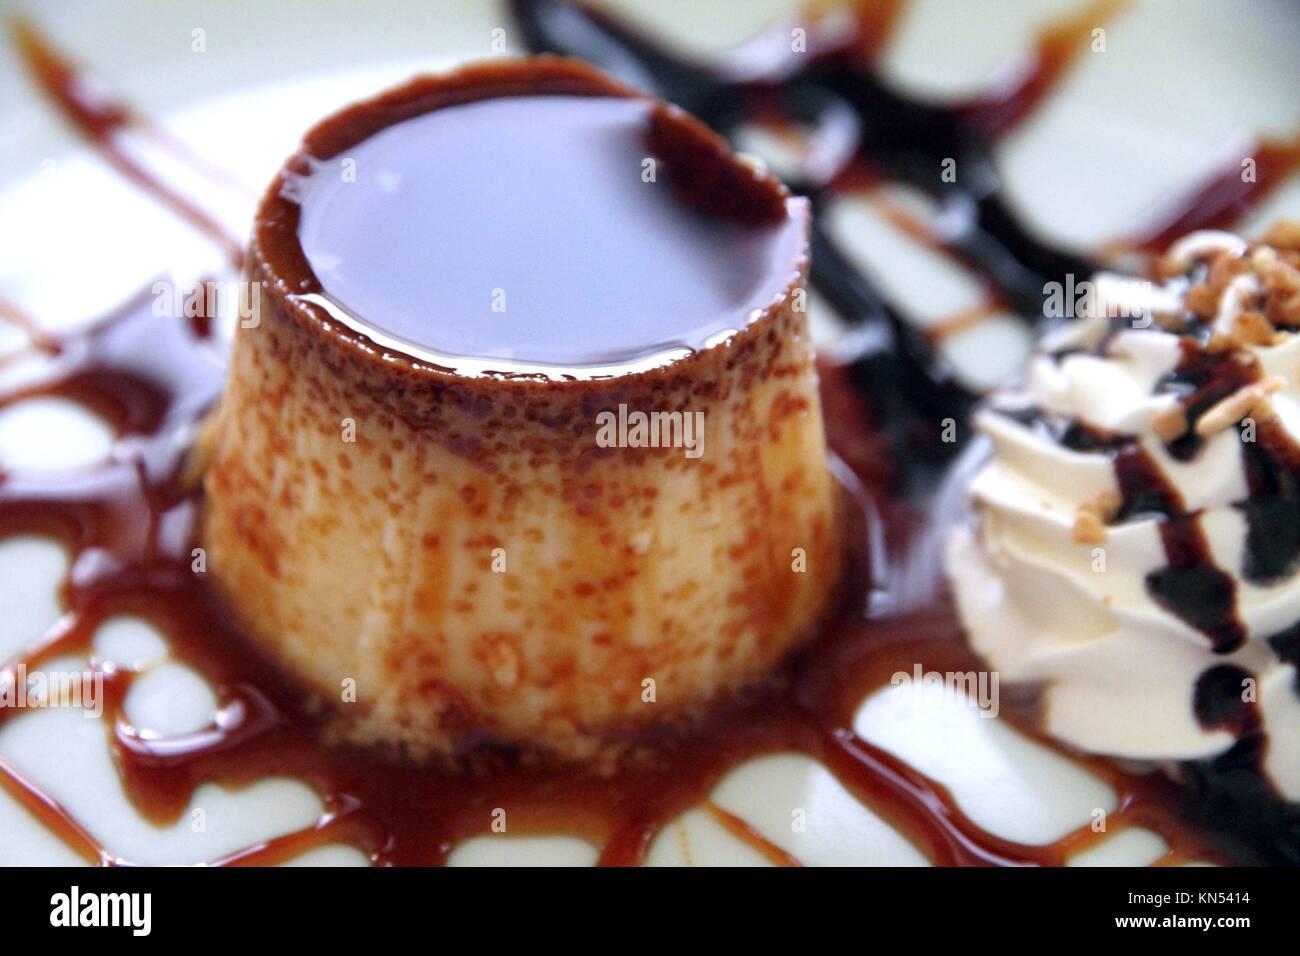 Flan con crema de caramelo en el plato postre España. Foto de stock